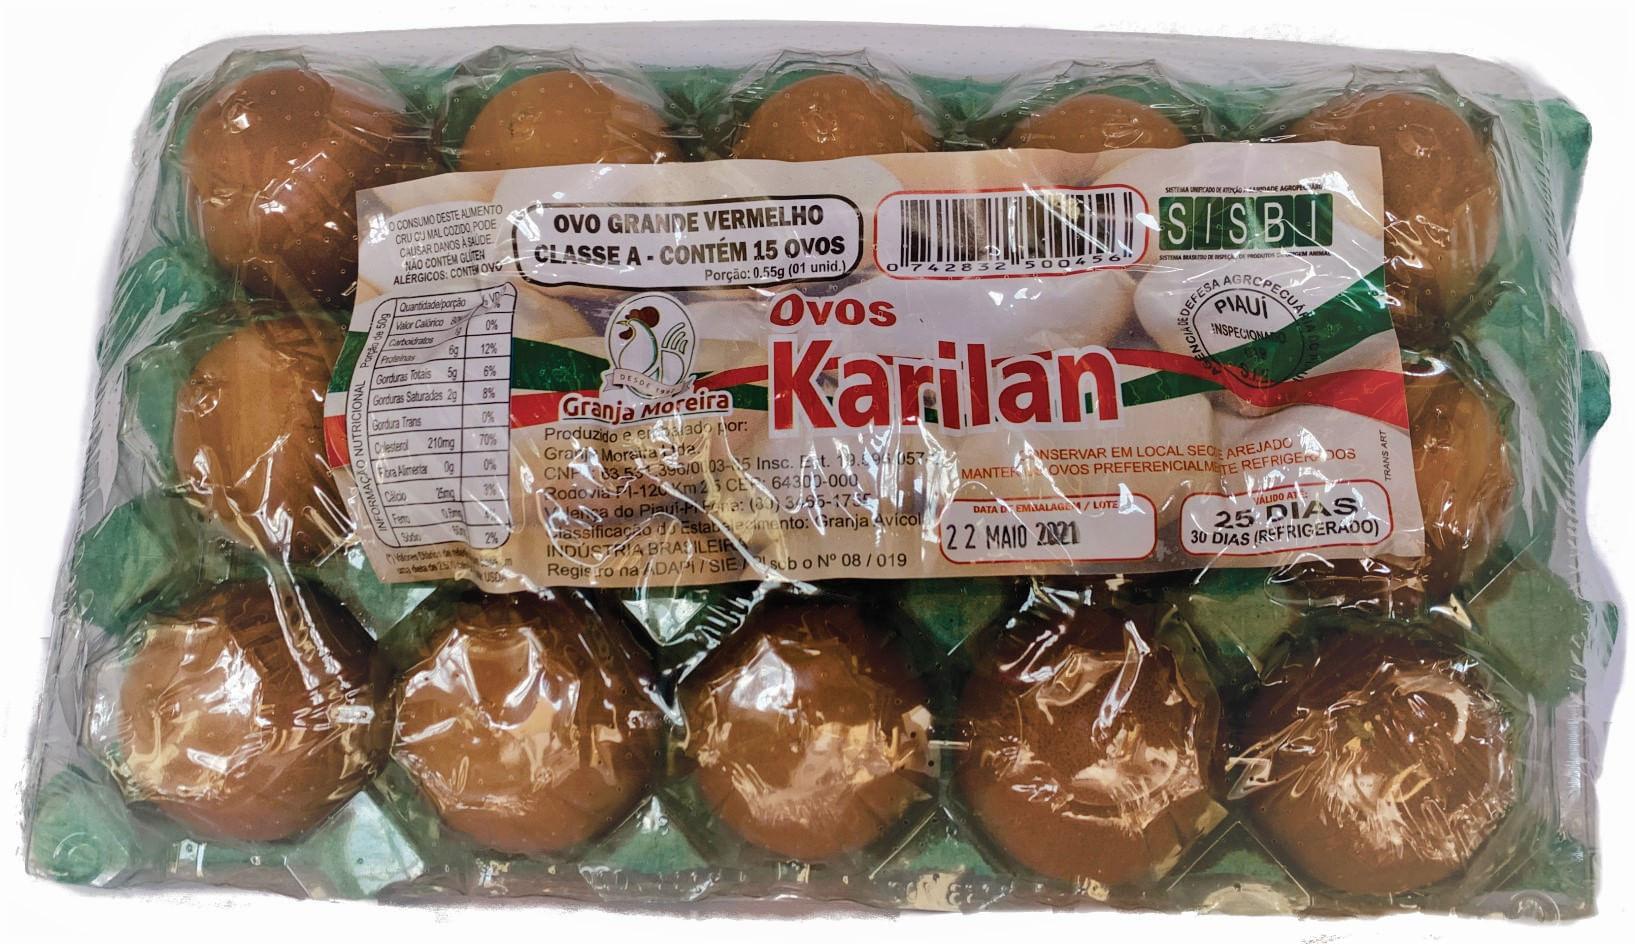 ovo-grande-vermelho-15-und-karilan